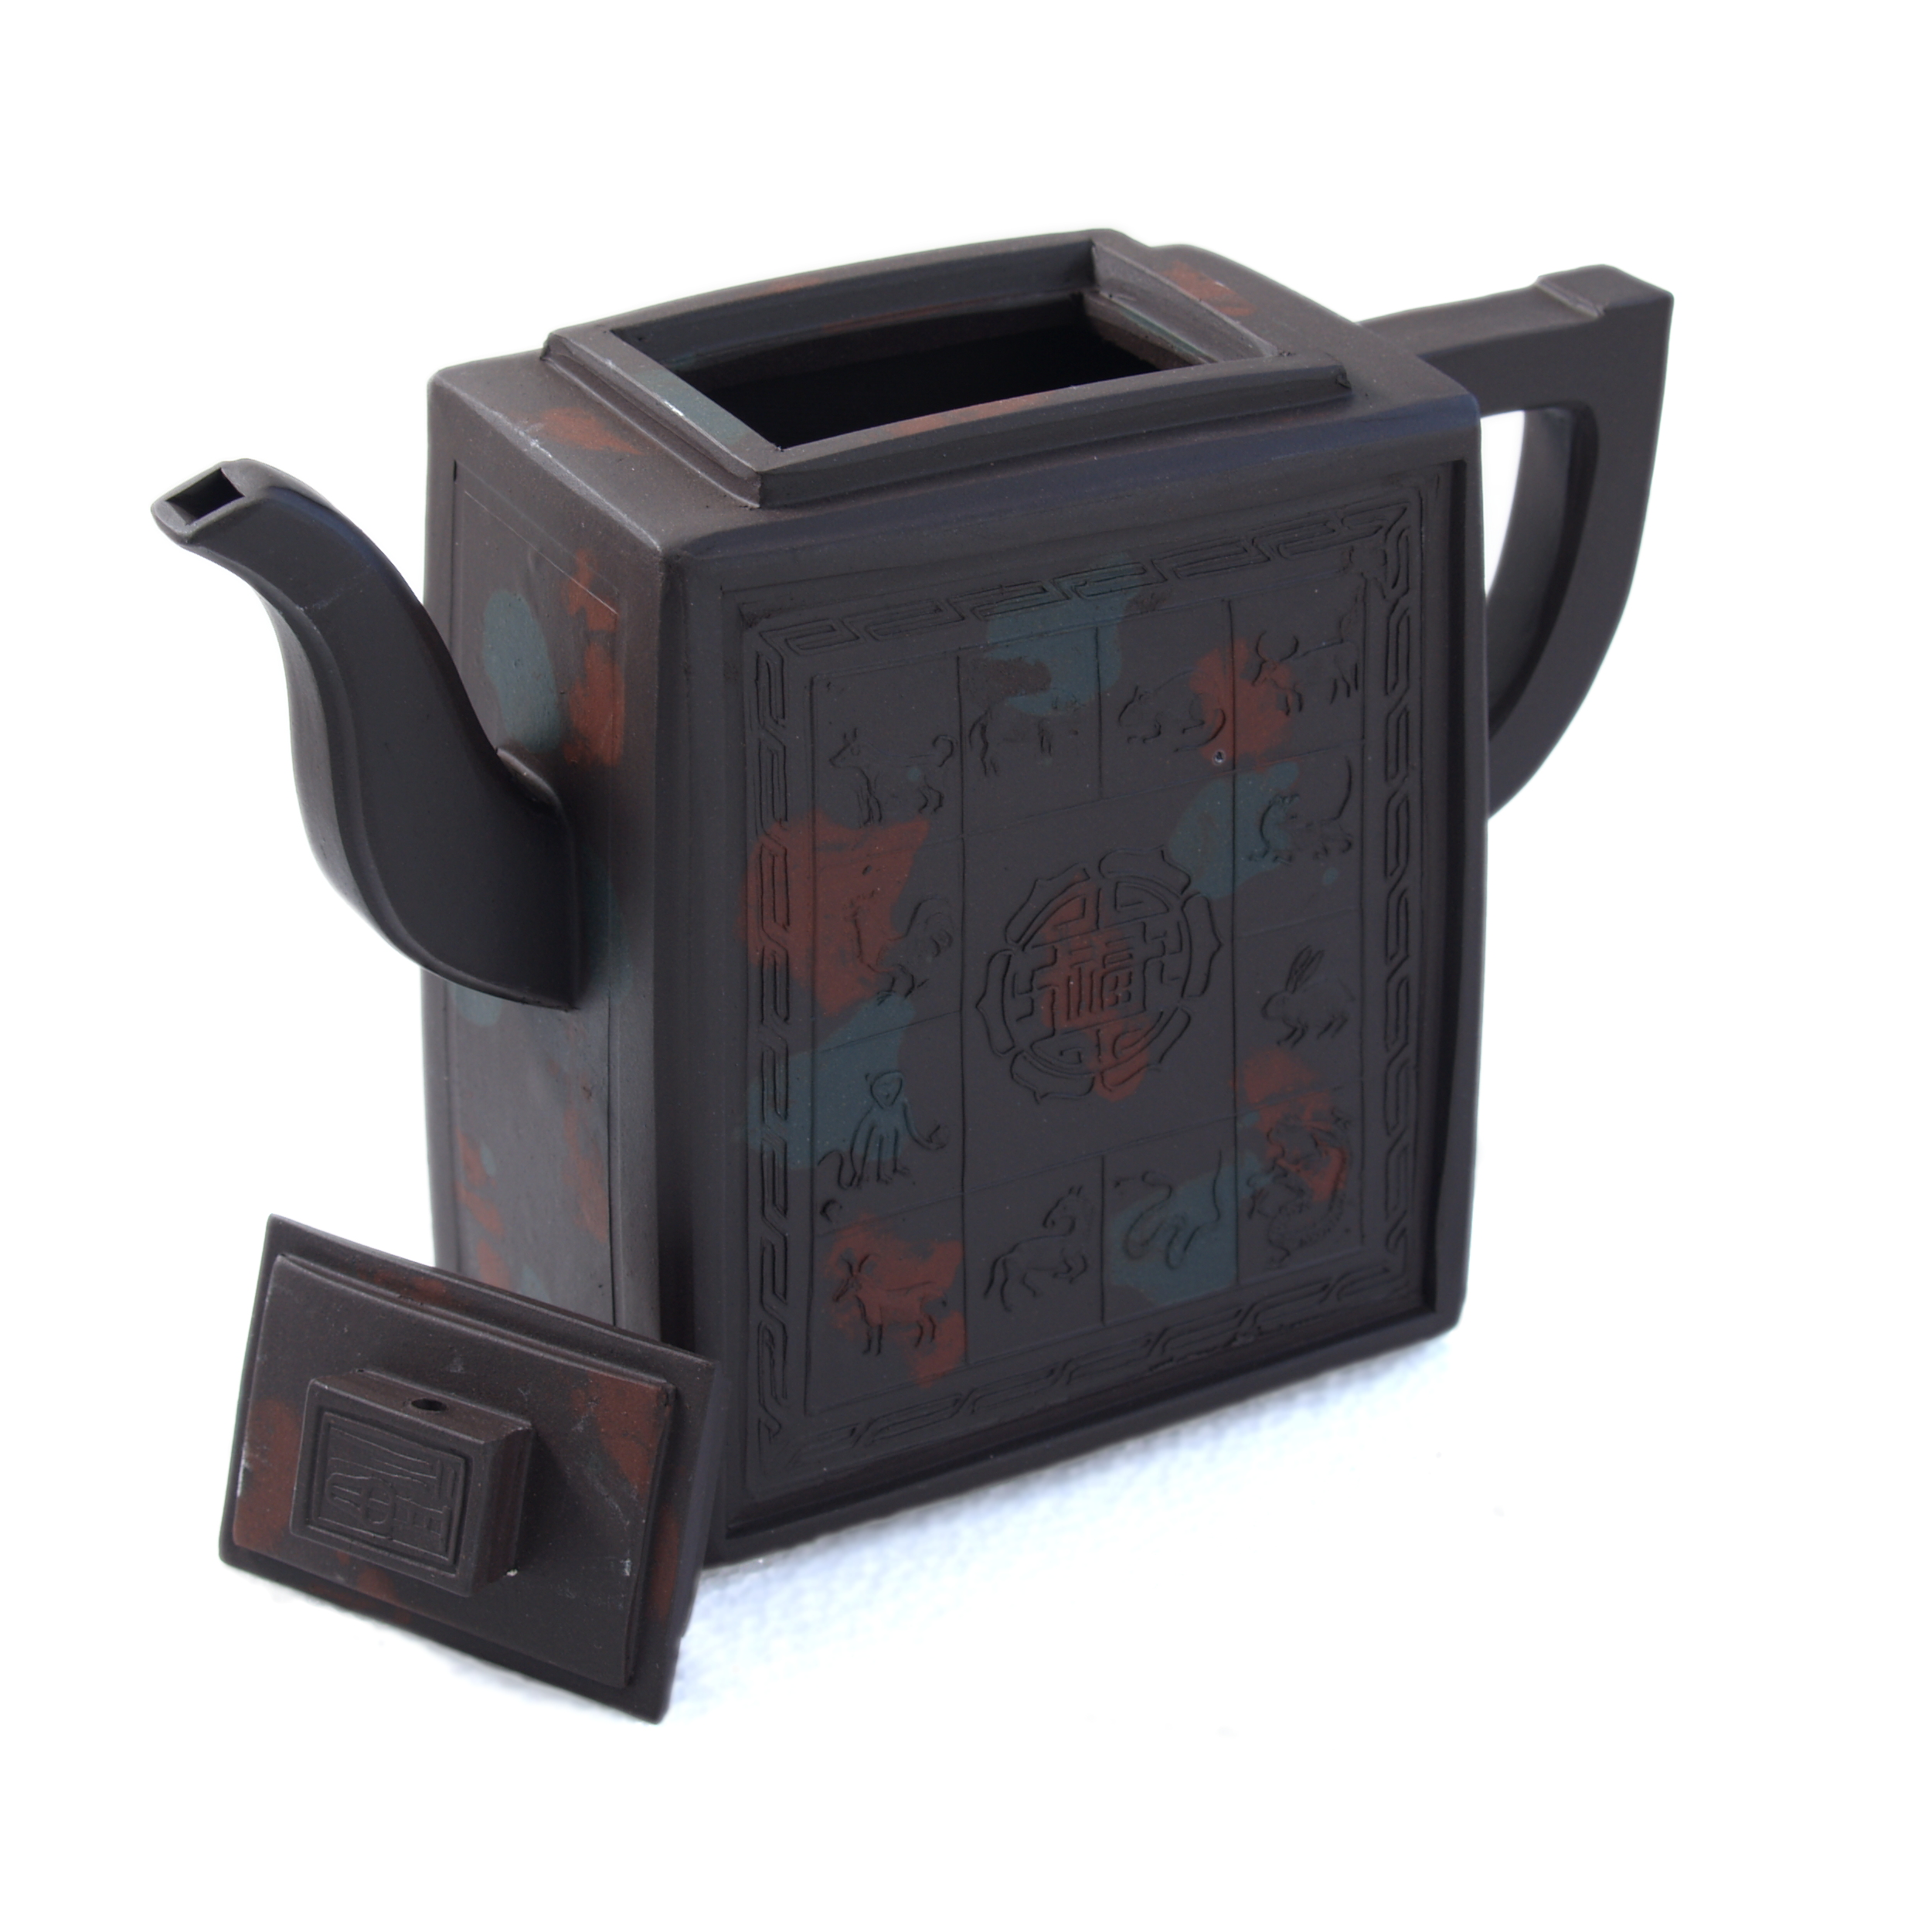 Yixing Zodiac Animal Squares Rectangular Teapot, 15 Ounce